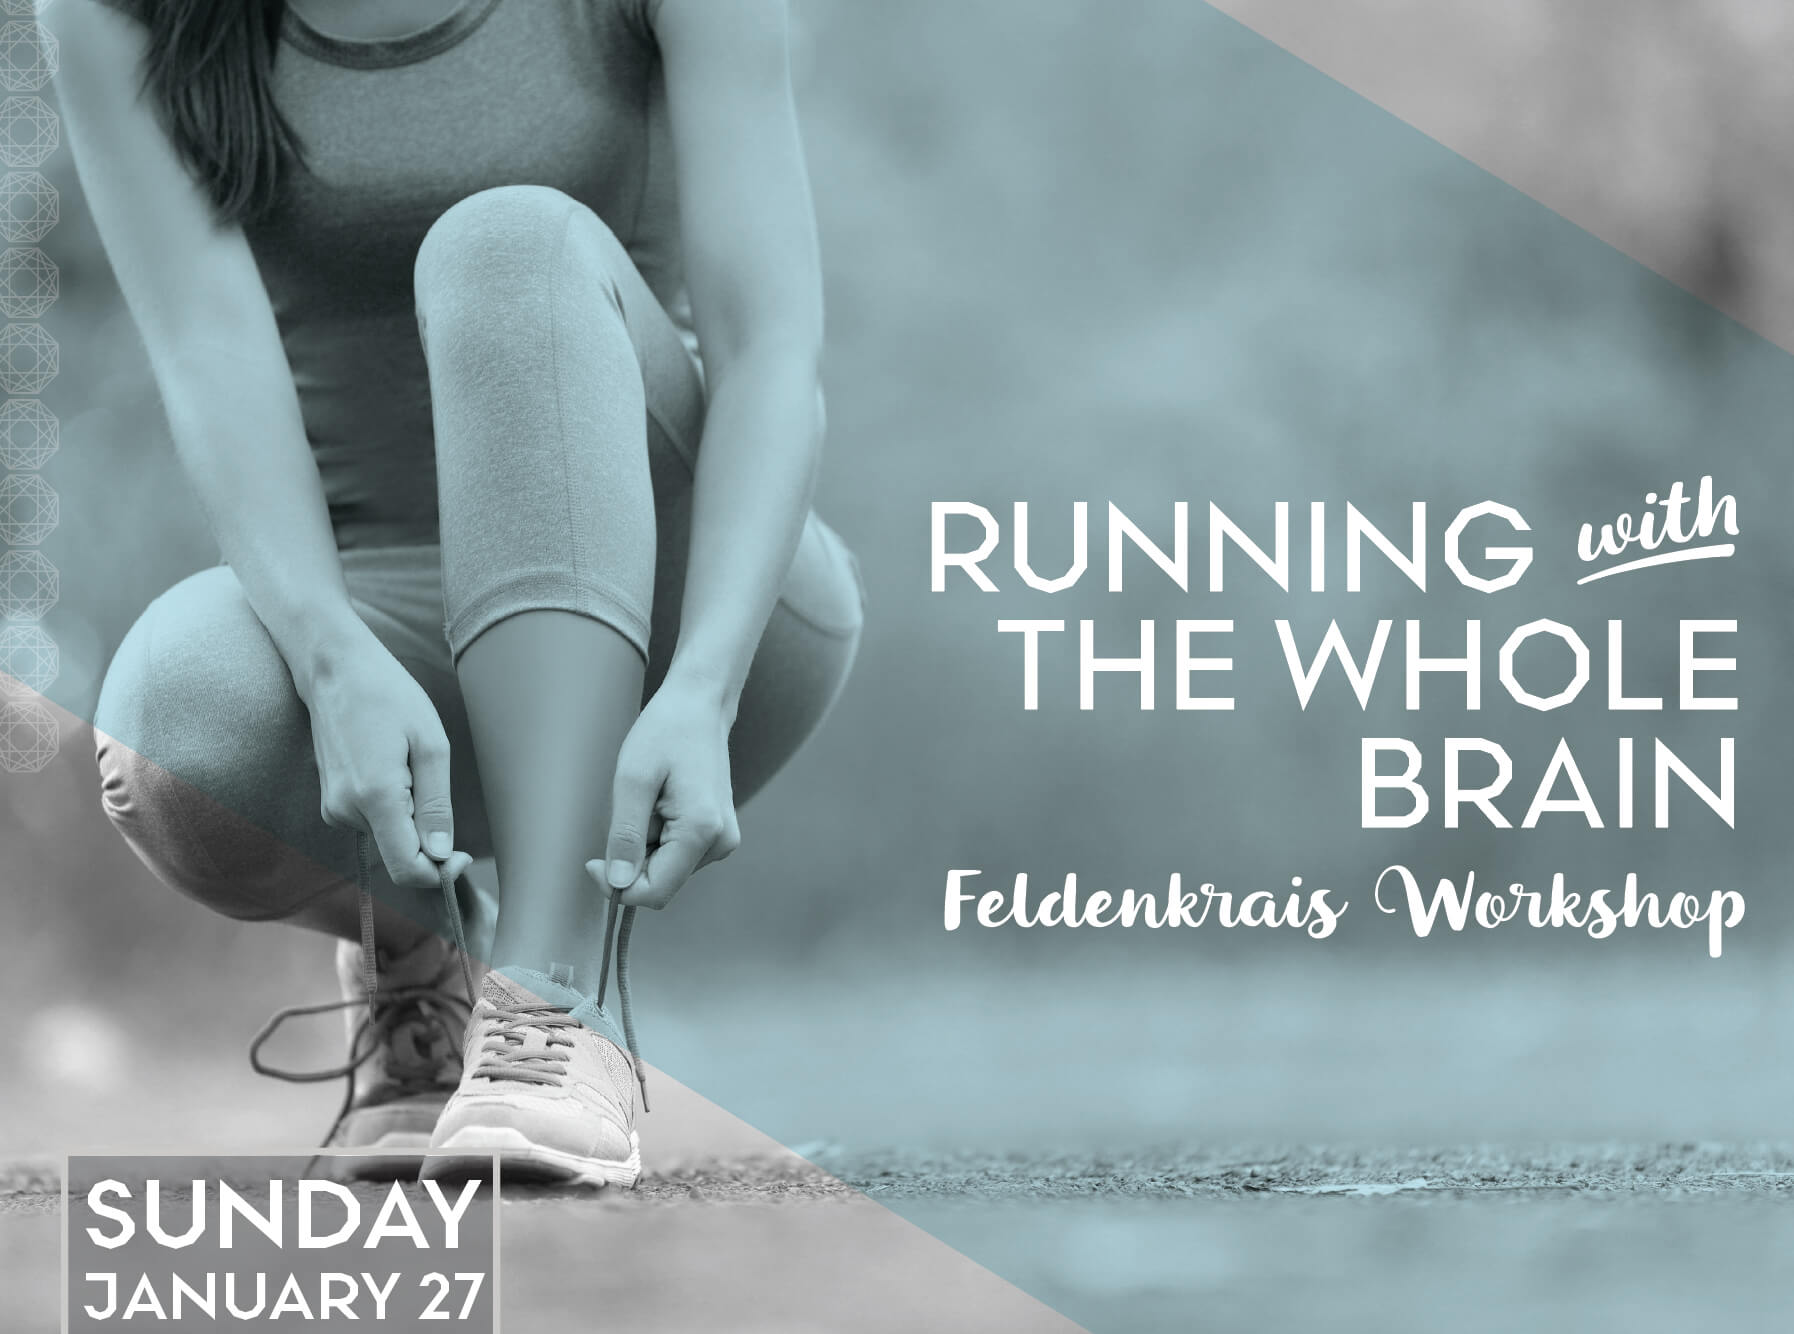 Running with the Whole Brain: Feldenkrais Workshop